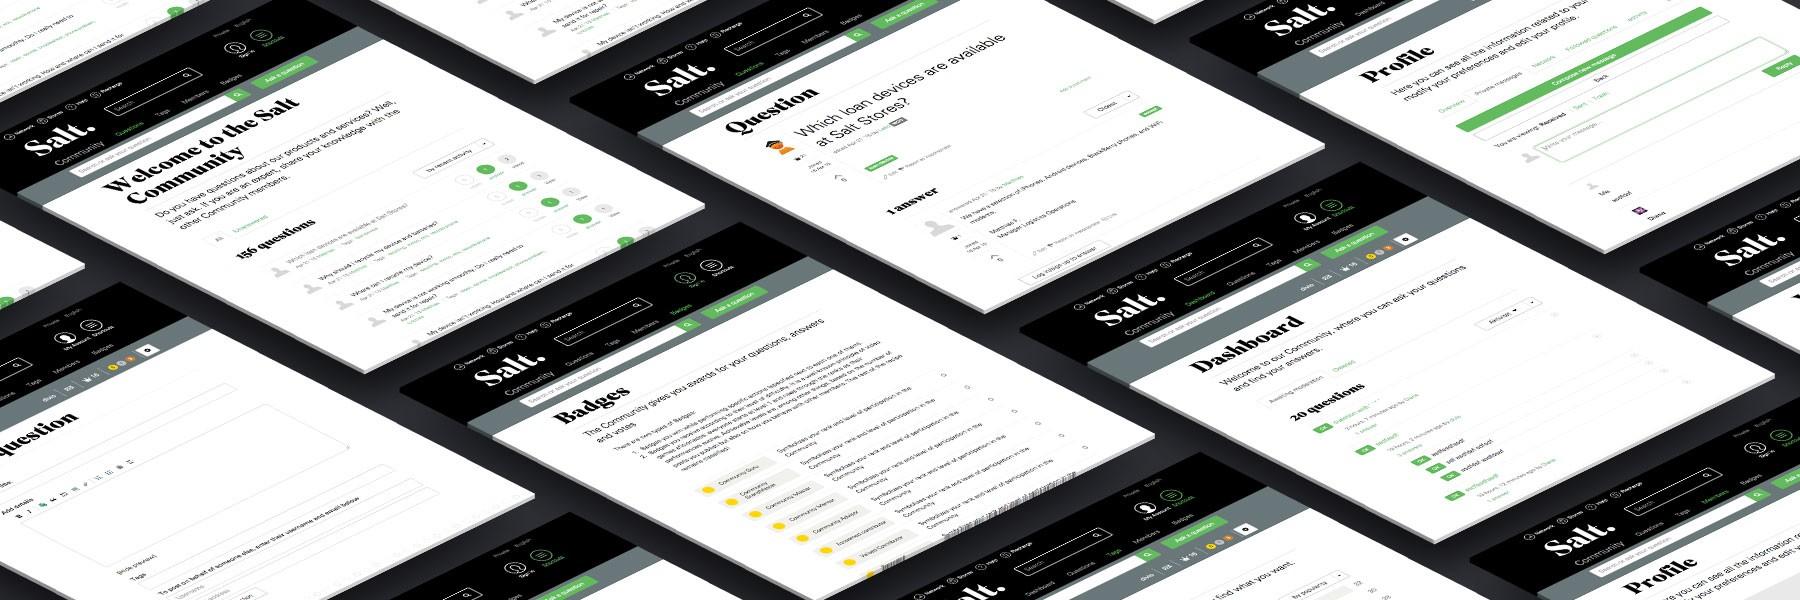 Salt Community website screens by Divio